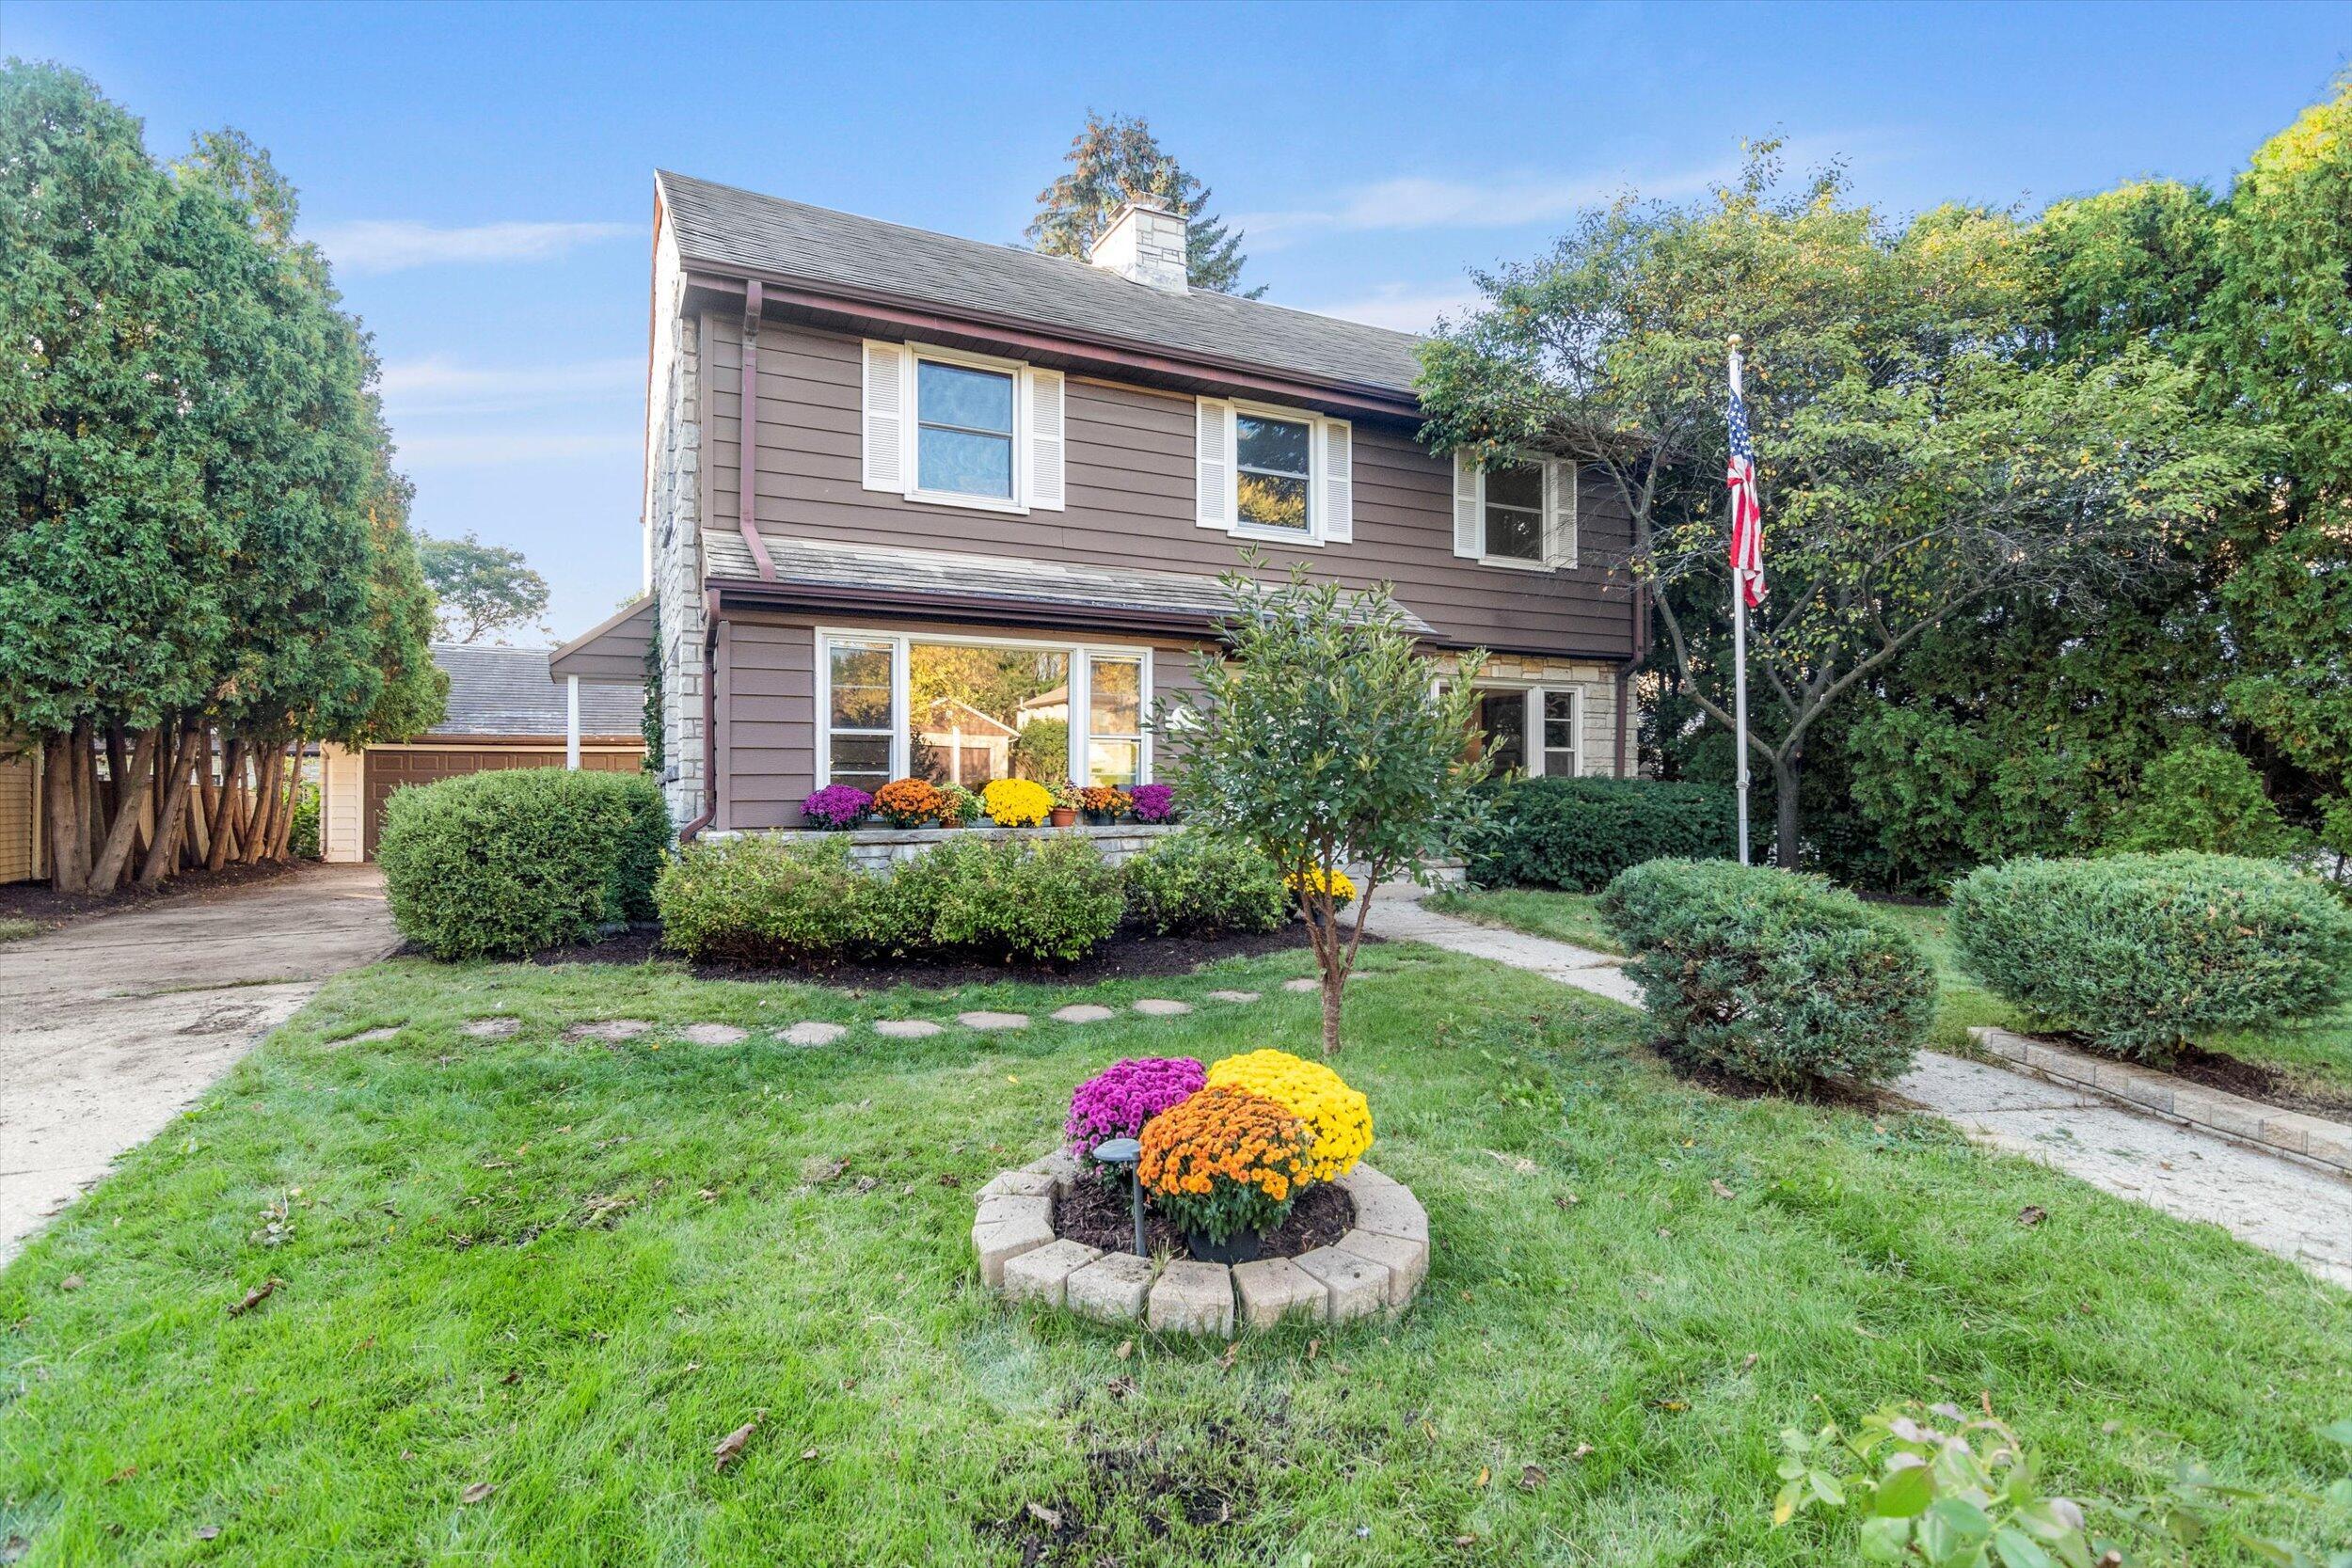 2465 Swan Blvd, Wauwatosa, Wisconsin 53226, 4 Bedrooms Bedrooms, 7 Rooms Rooms,2 BathroomsBathrooms,Single-Family,For Sale,Swan Blvd,1768269